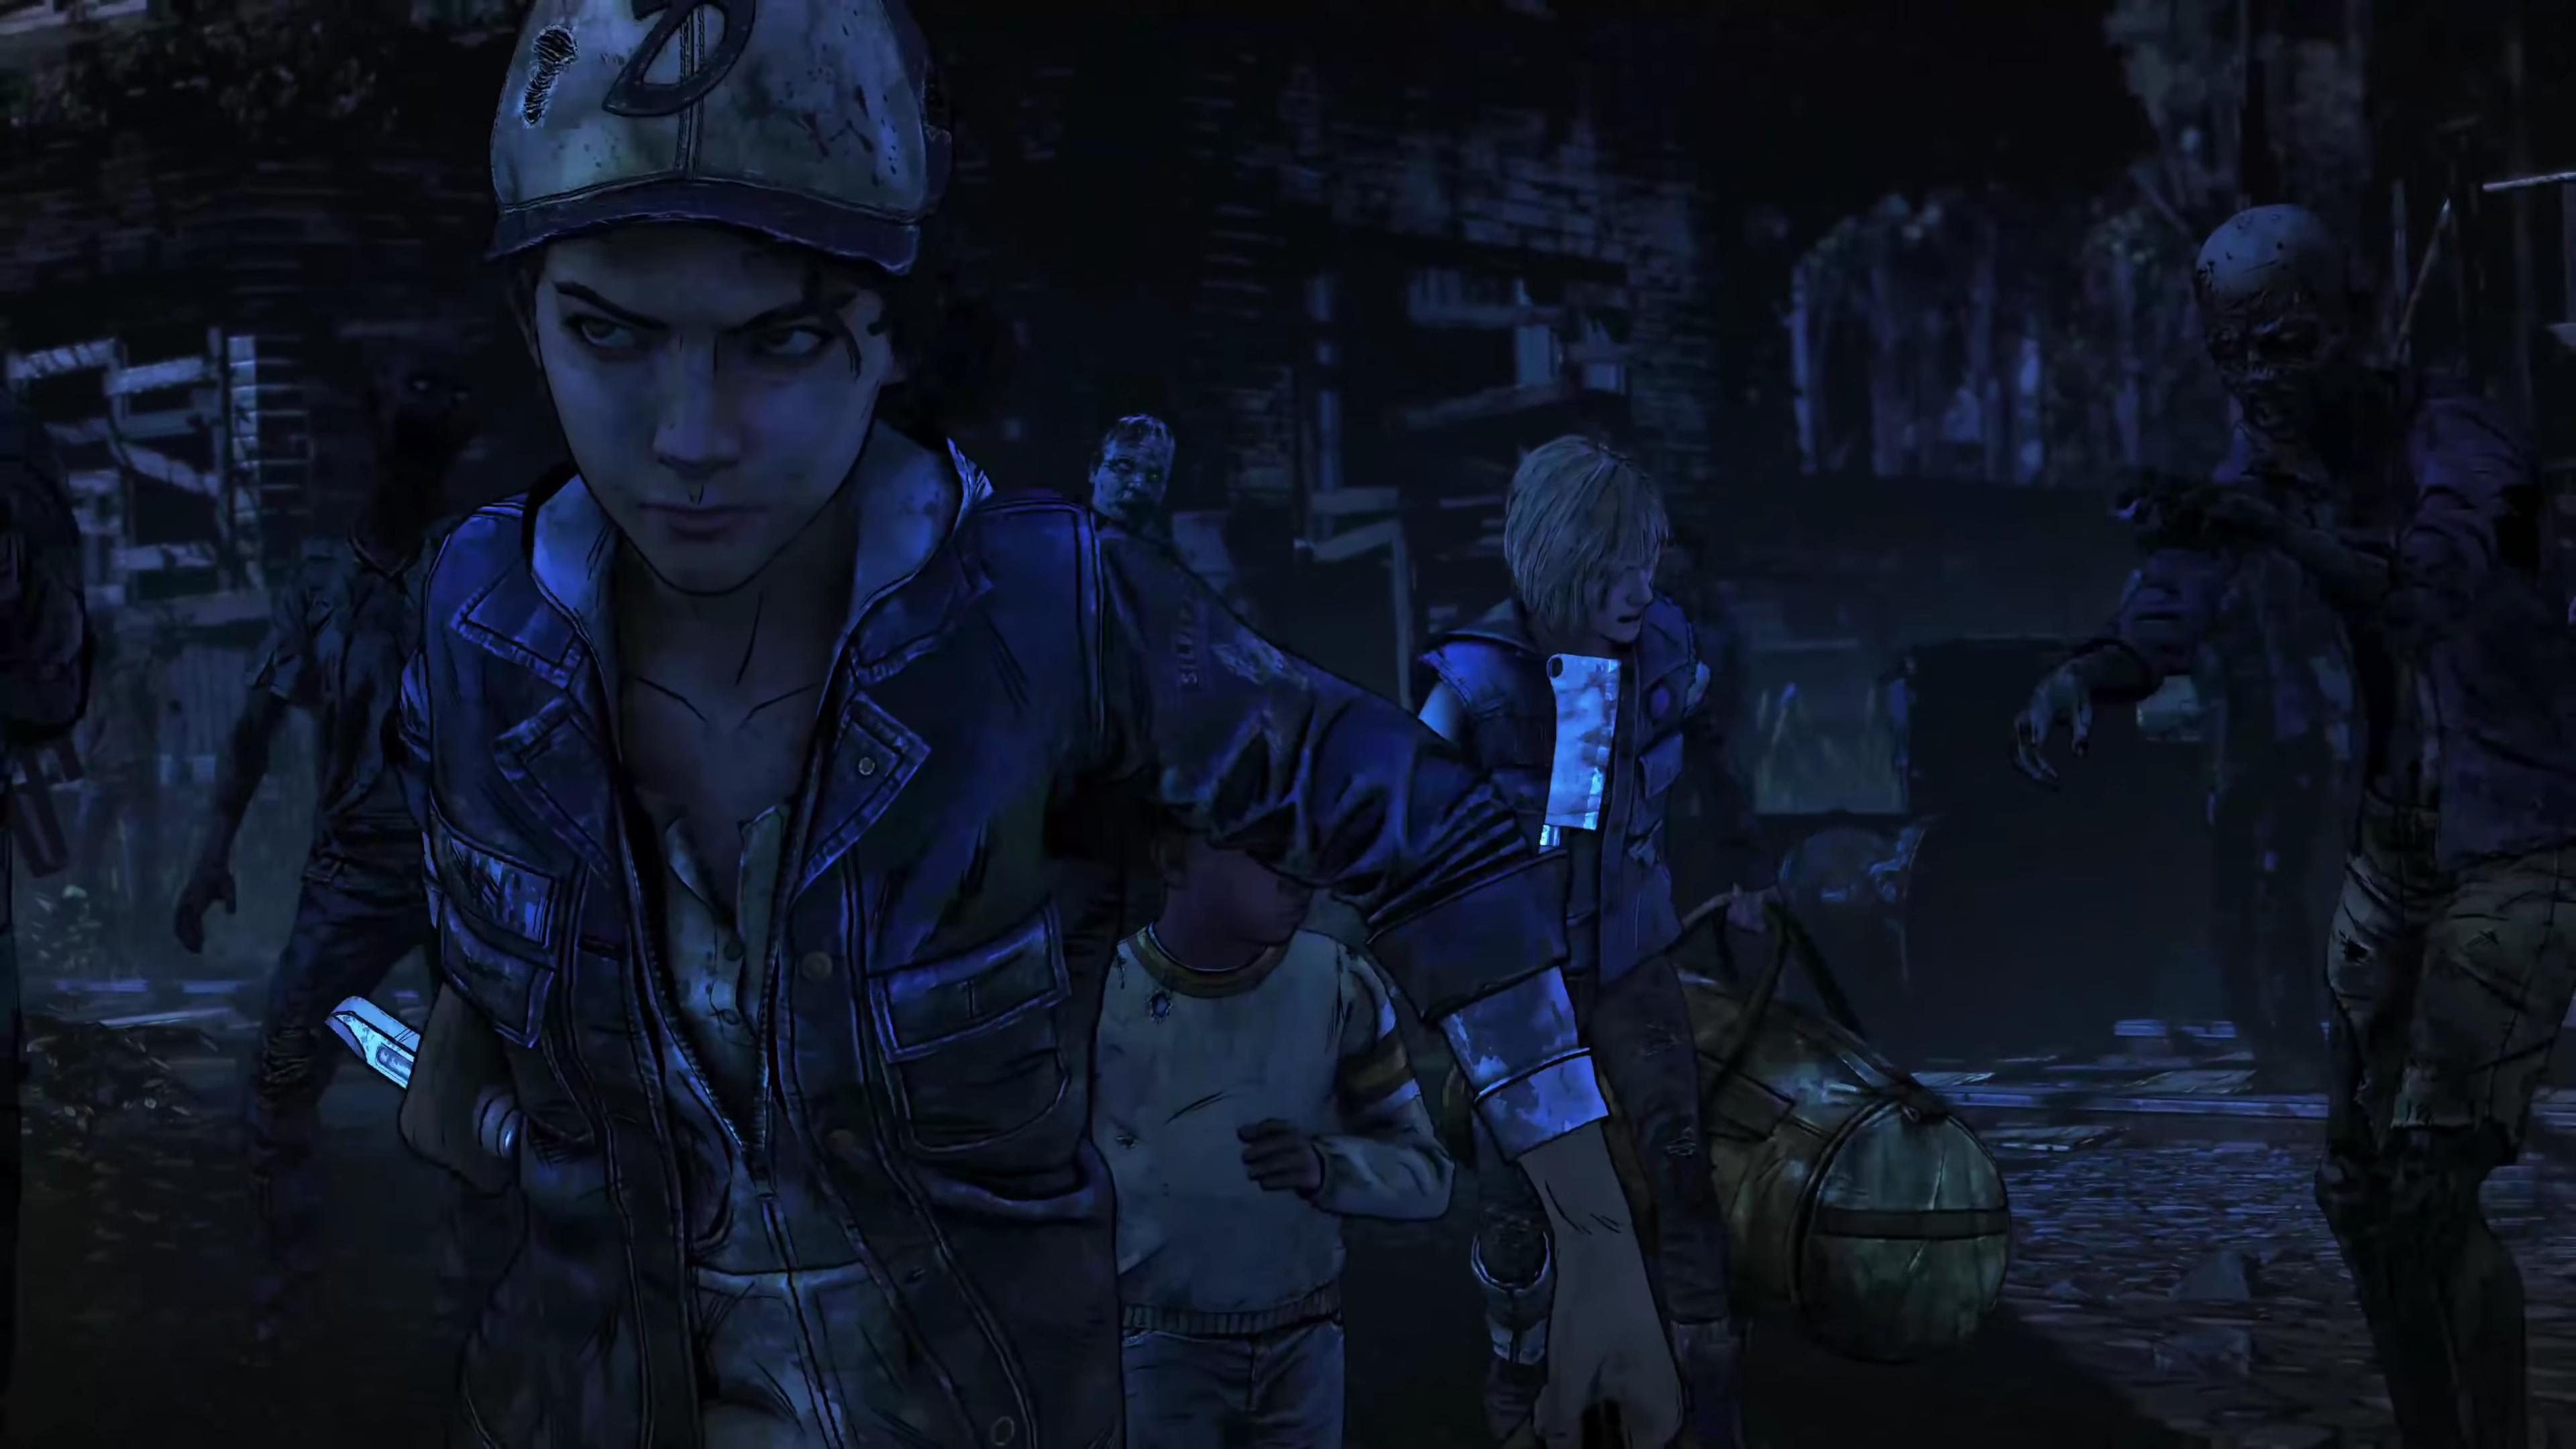 Снимок - 1.png - Walking Dead: The Final Season, the